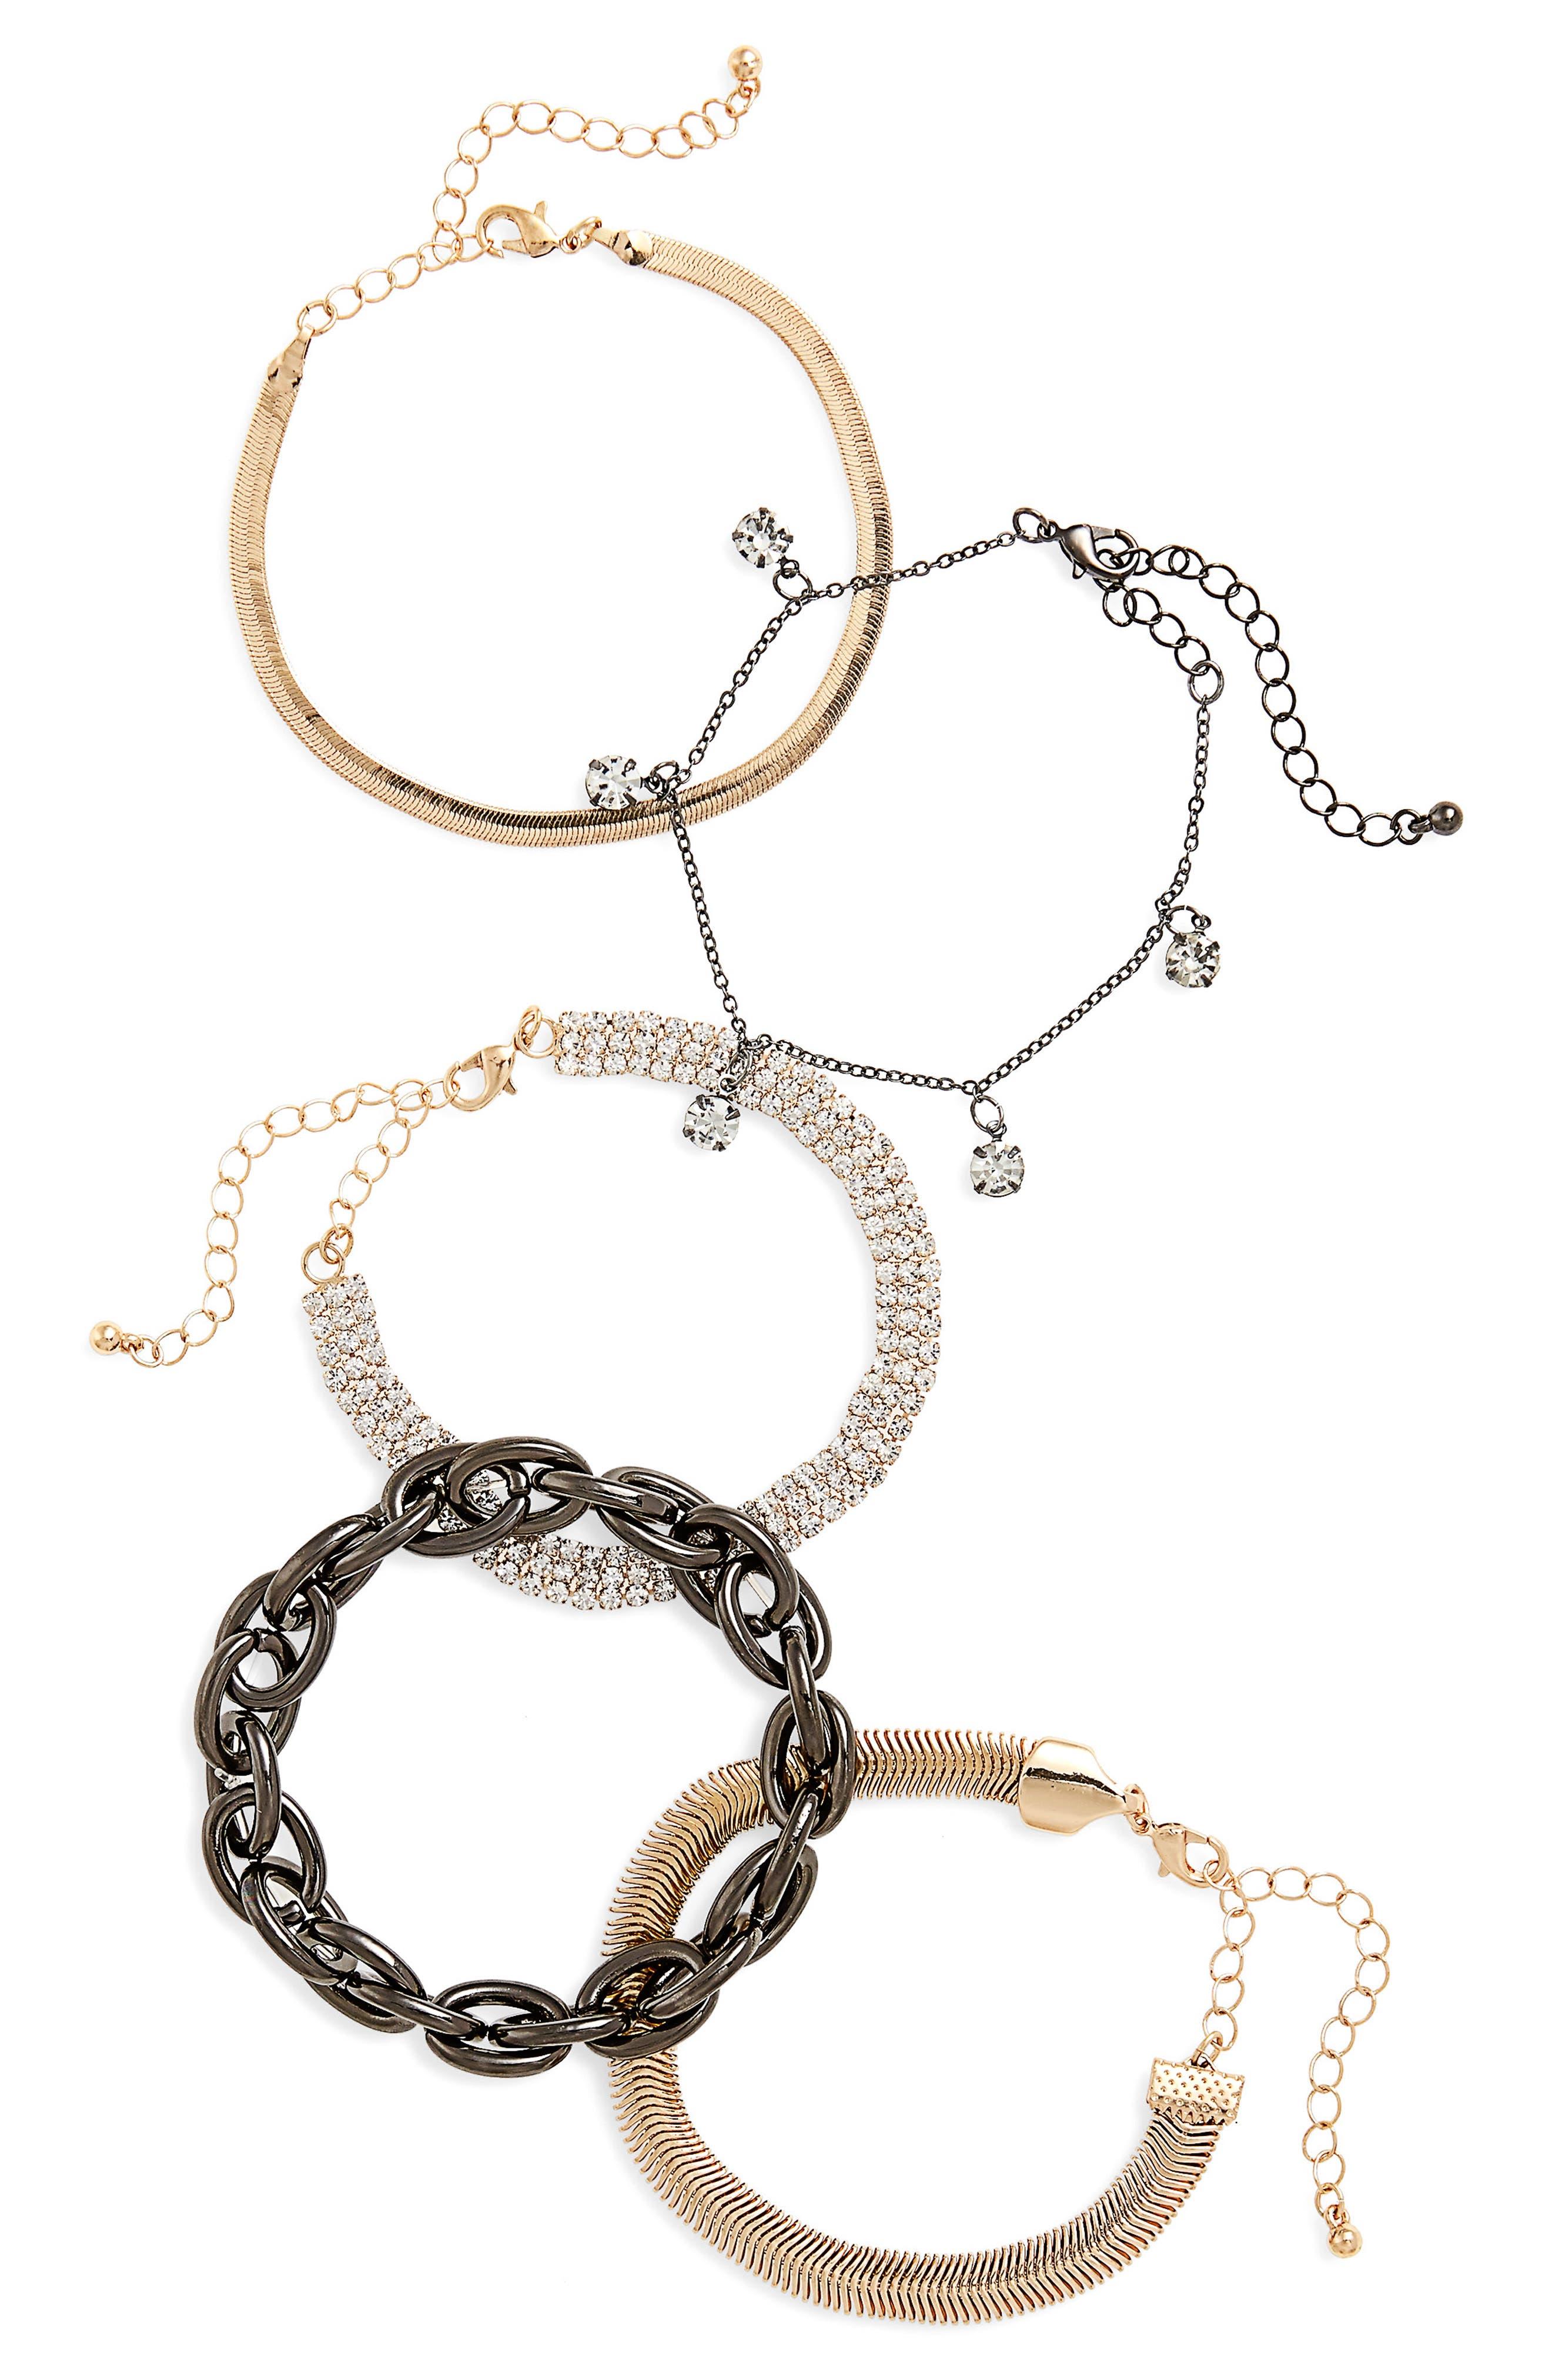 5-Pack Crystal Bracelets,                             Main thumbnail 1, color,                             Gold/ Crystal/ Gunmetal